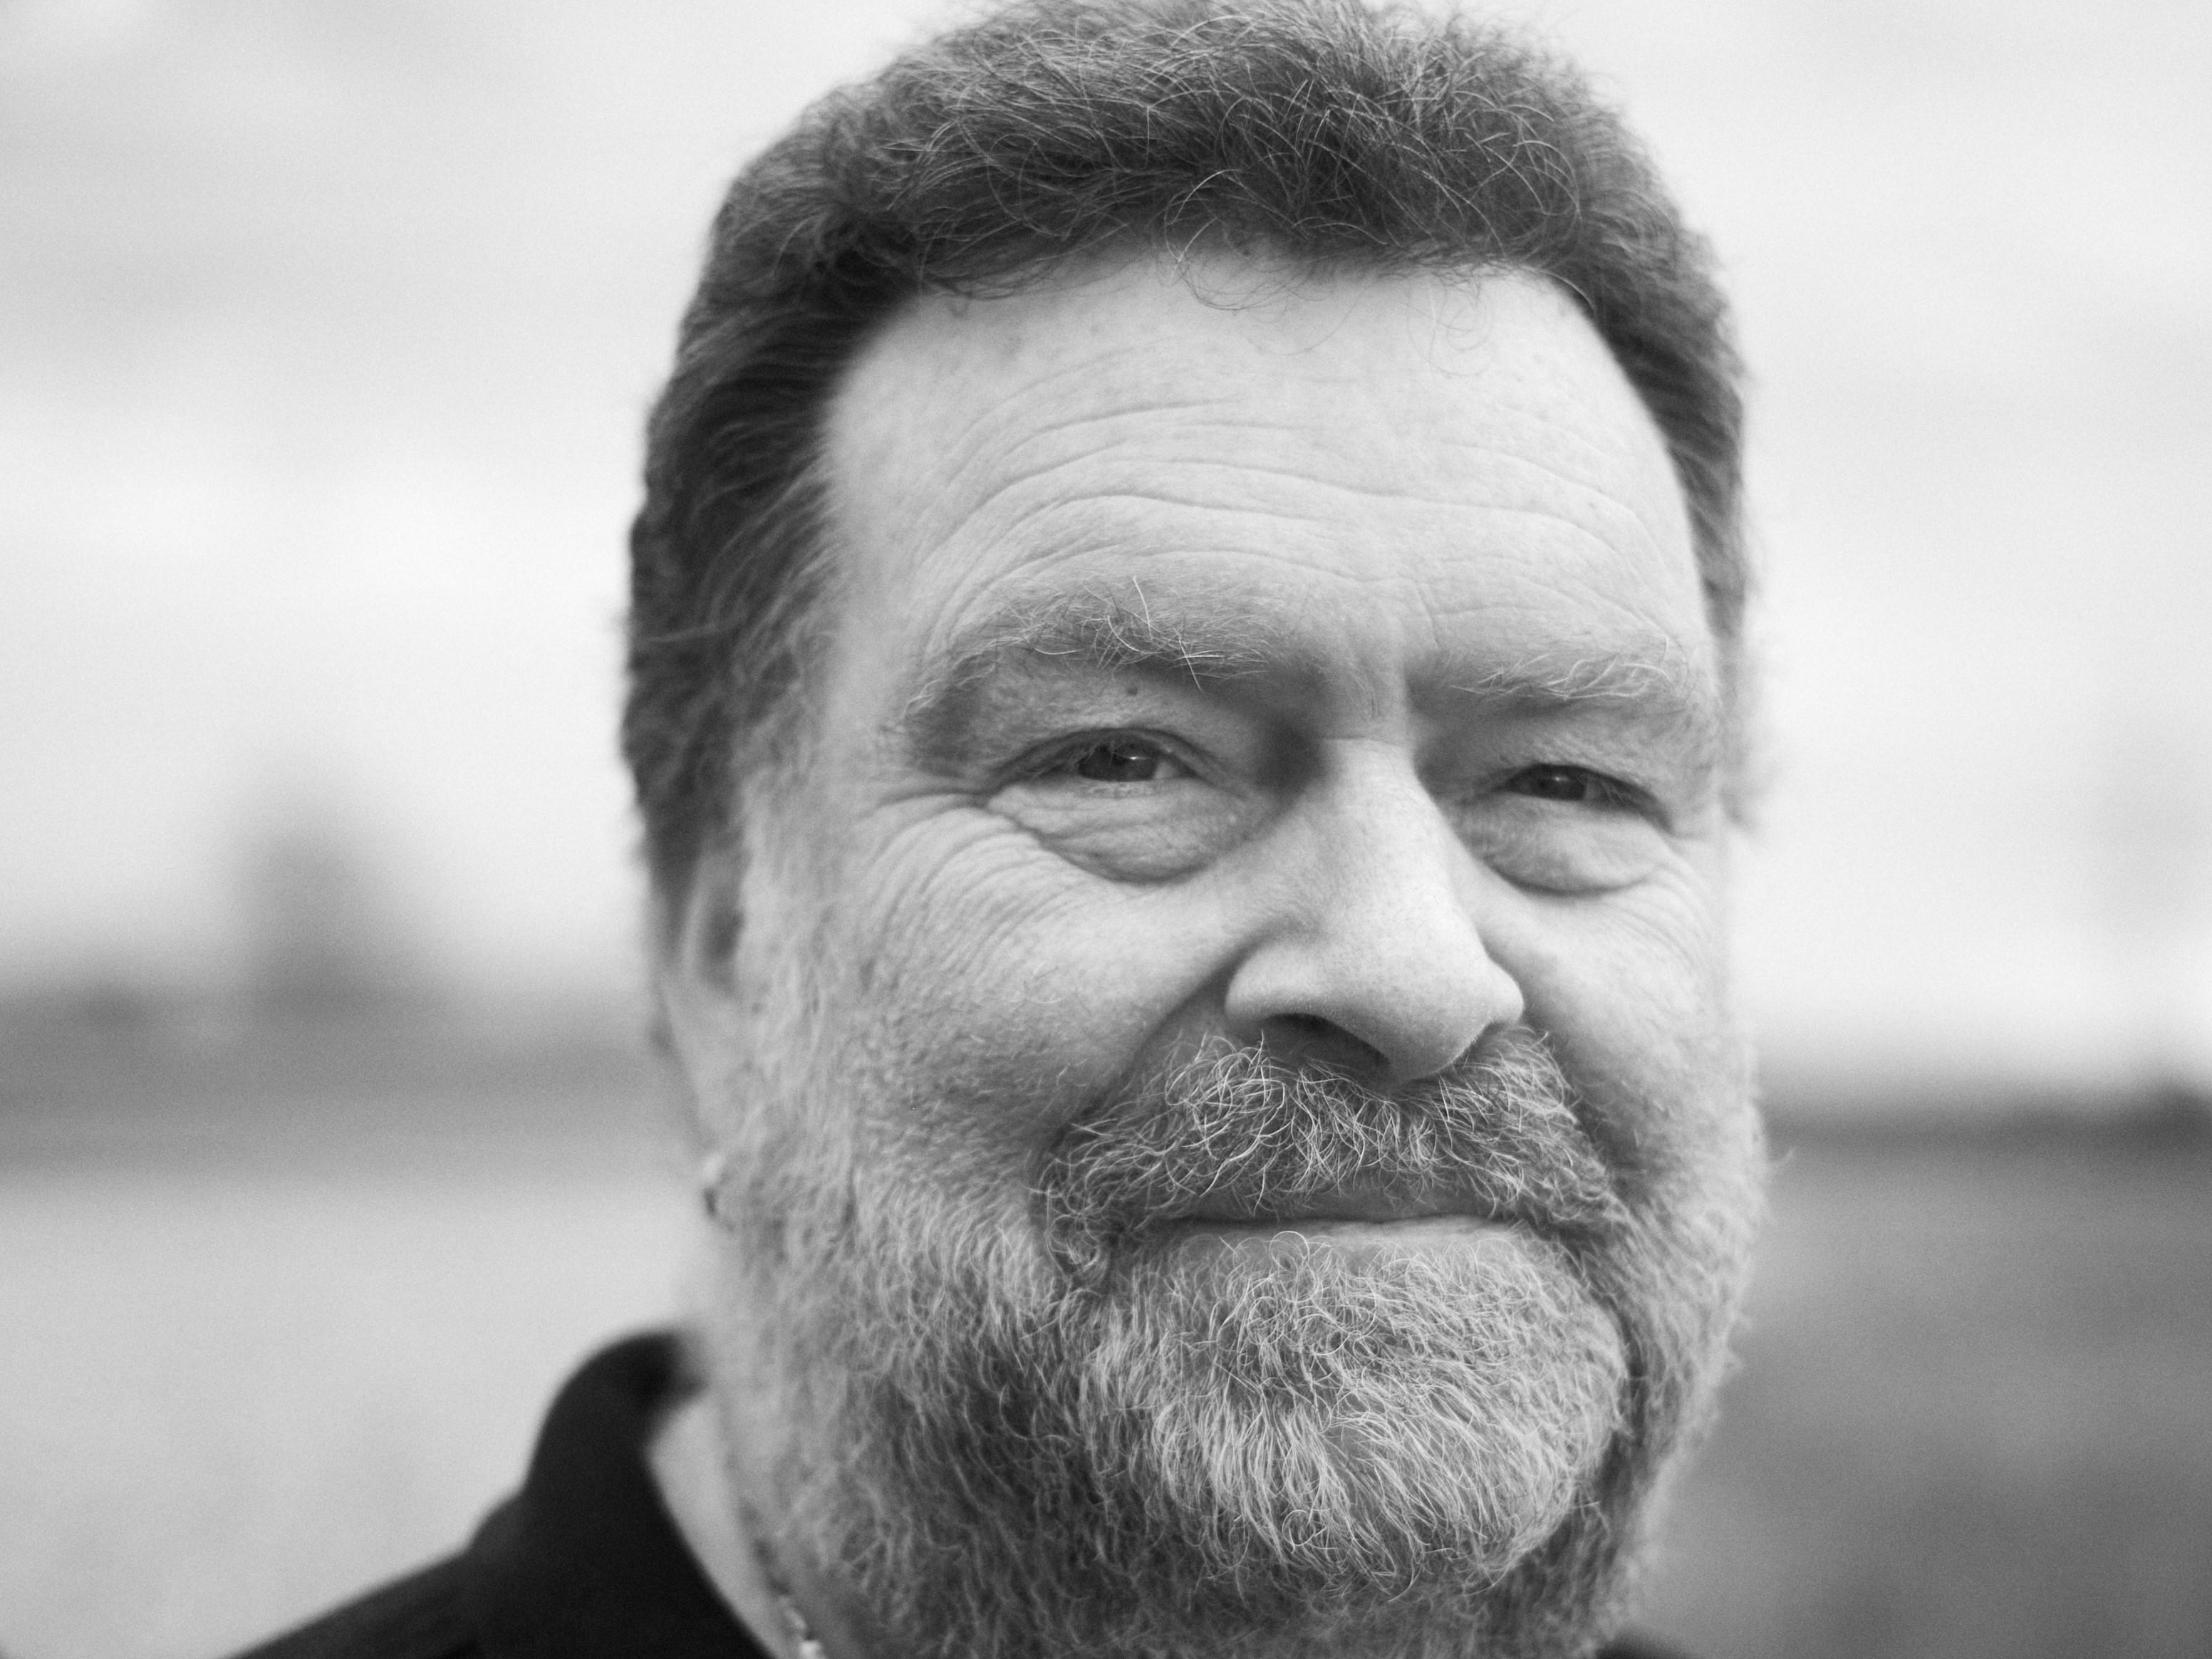 Peter Seizinger